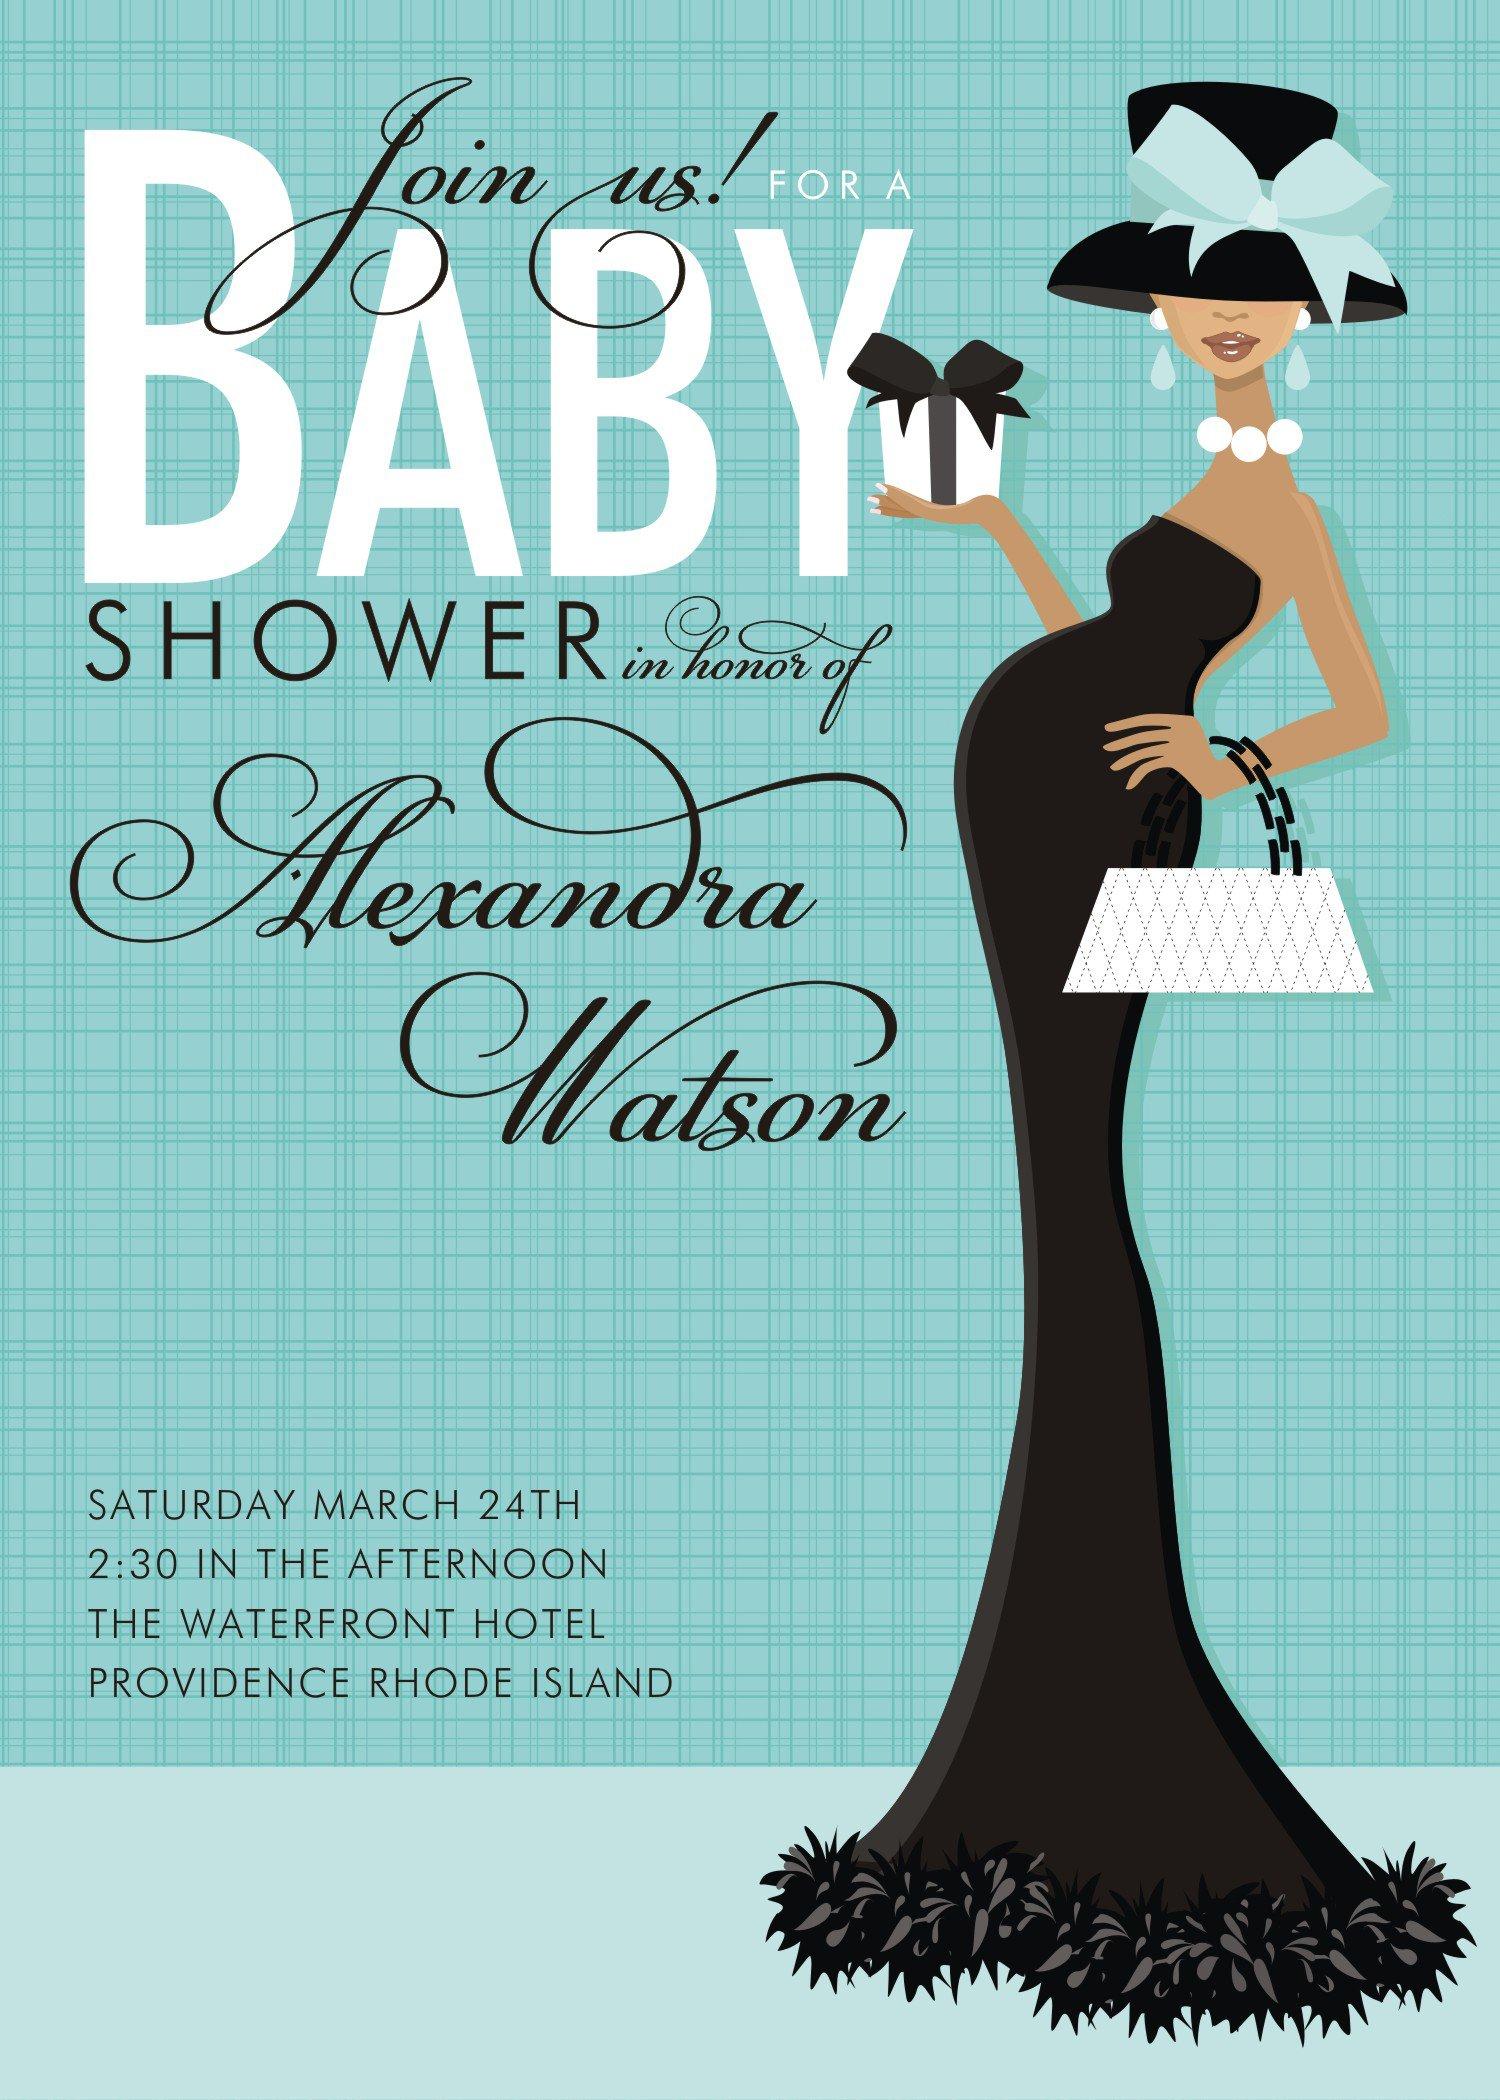 Free Customizable Baby Shower Invitations Templates